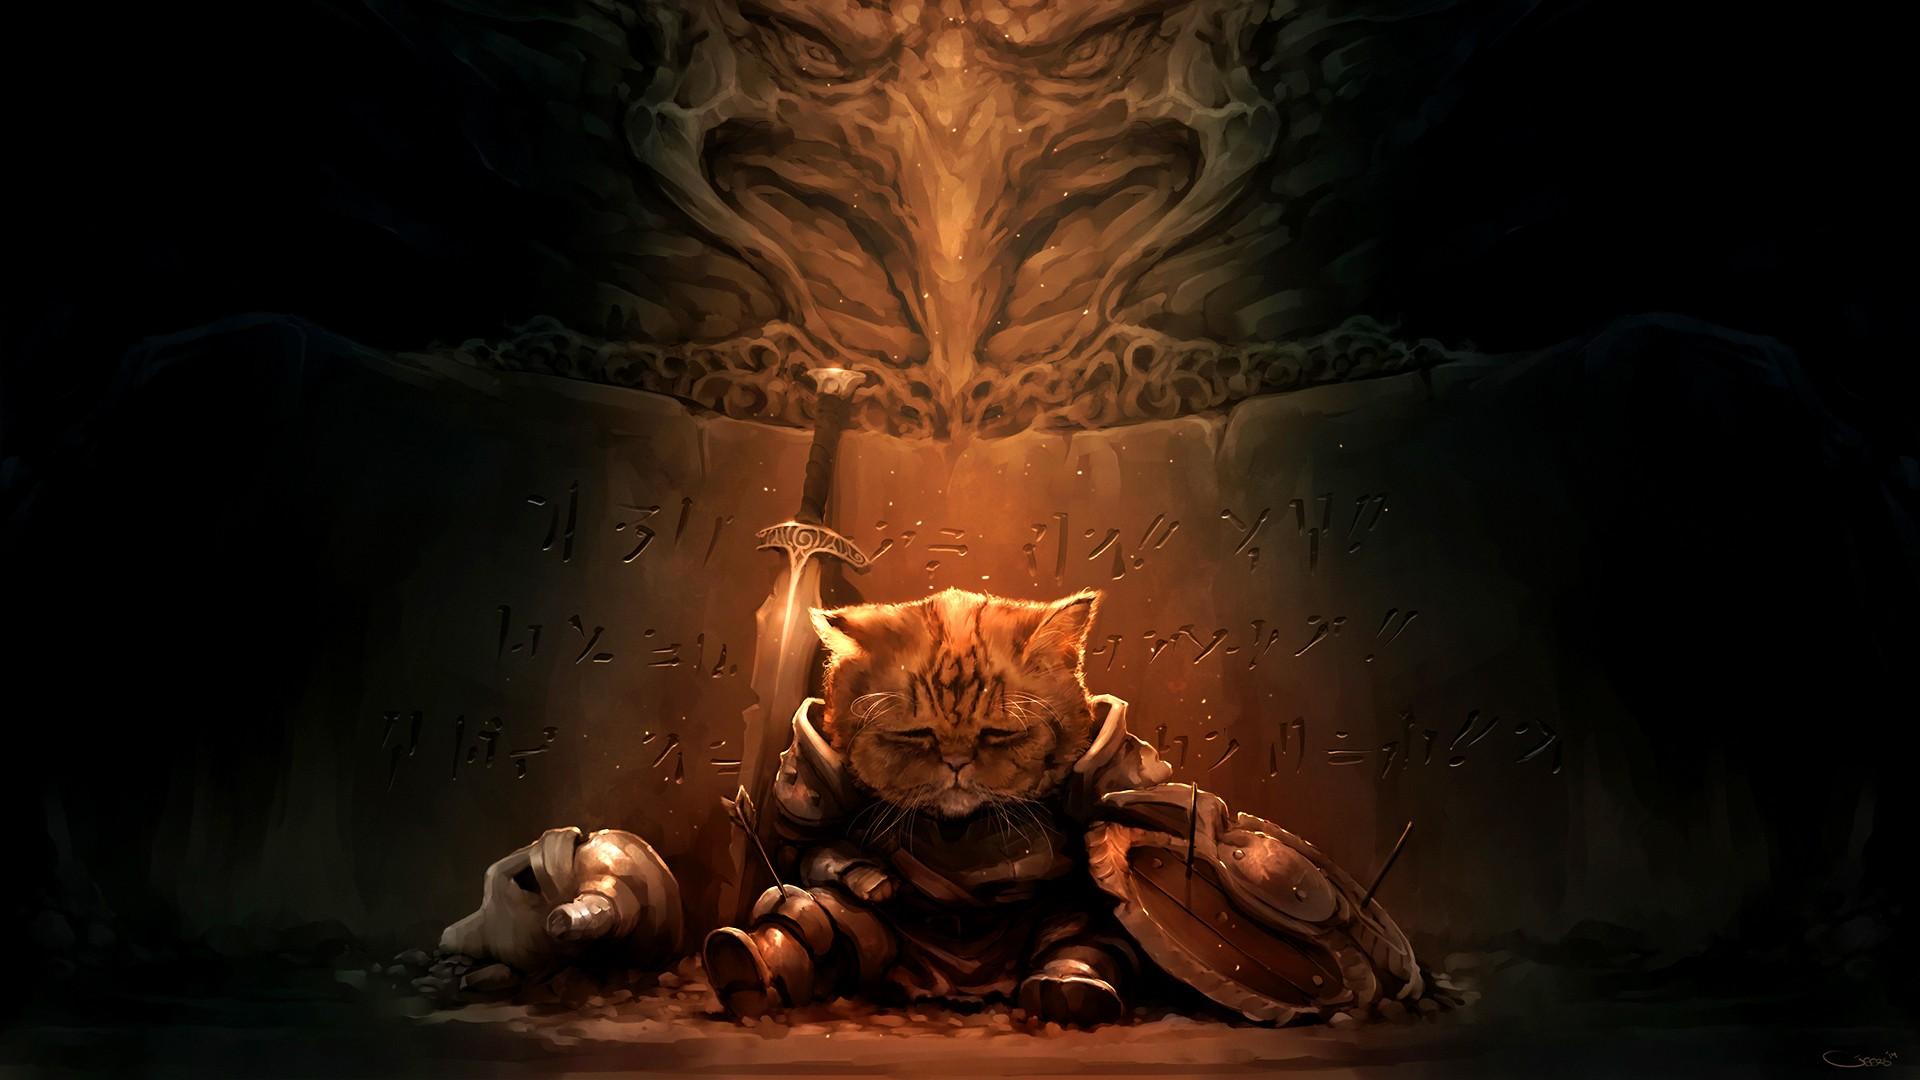 Crazy 3d Wallpapers Hd Download Free Warrior Cats Backgrounds Pixelstalk Net